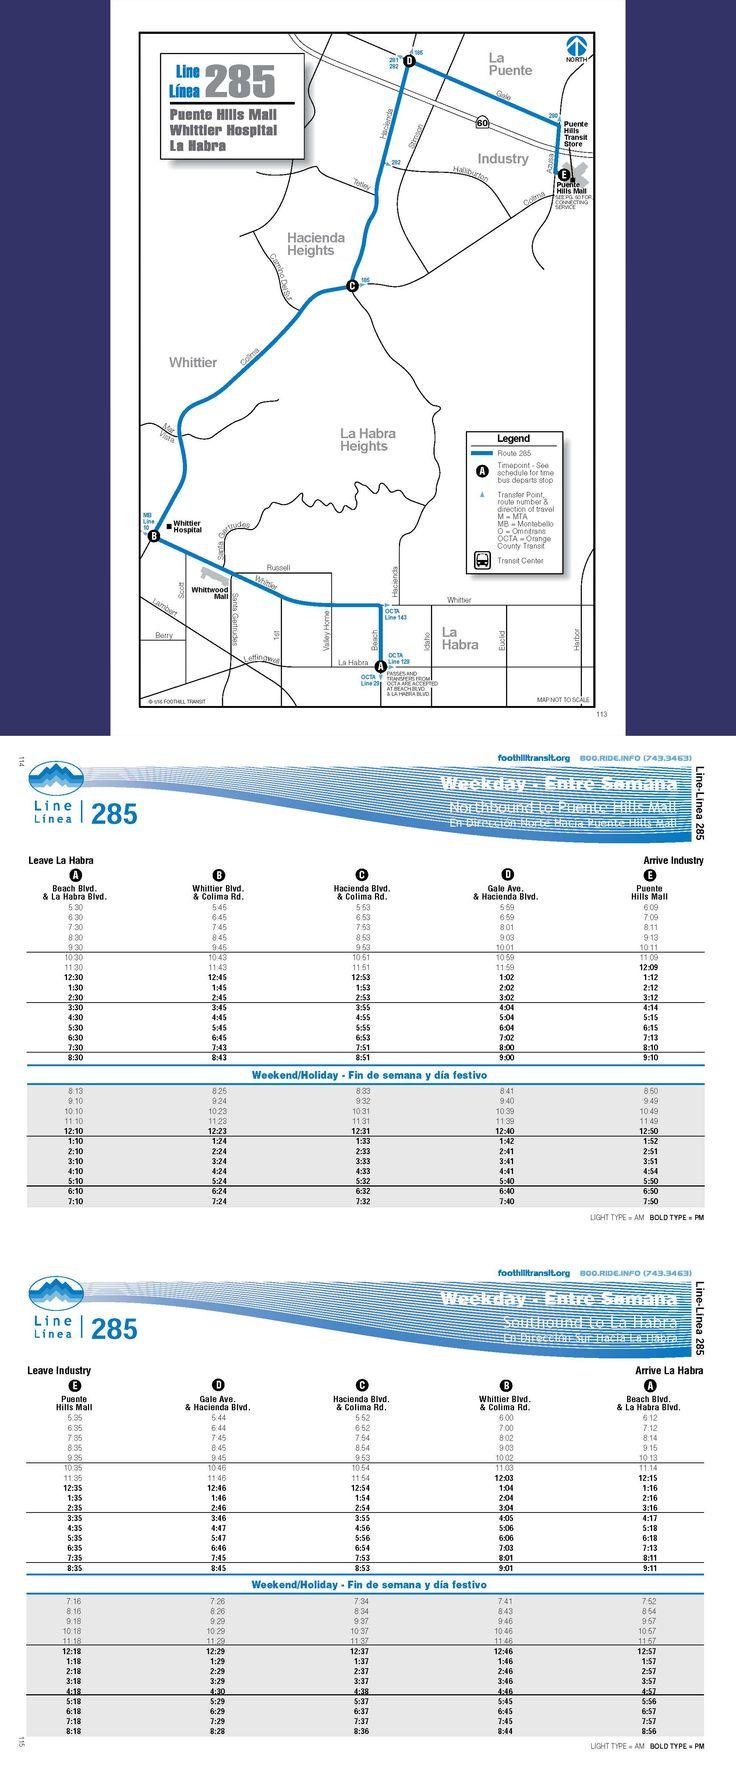 Line 285 serves Industry, La Puente, Hacienda Heights, and Whittier. Popular destinations include Whittier Christian High School, La Habra High School, The Children's Museum at La Habra, Whittwood Mall, Whittier Hospital, La Serna High School, and California High School.